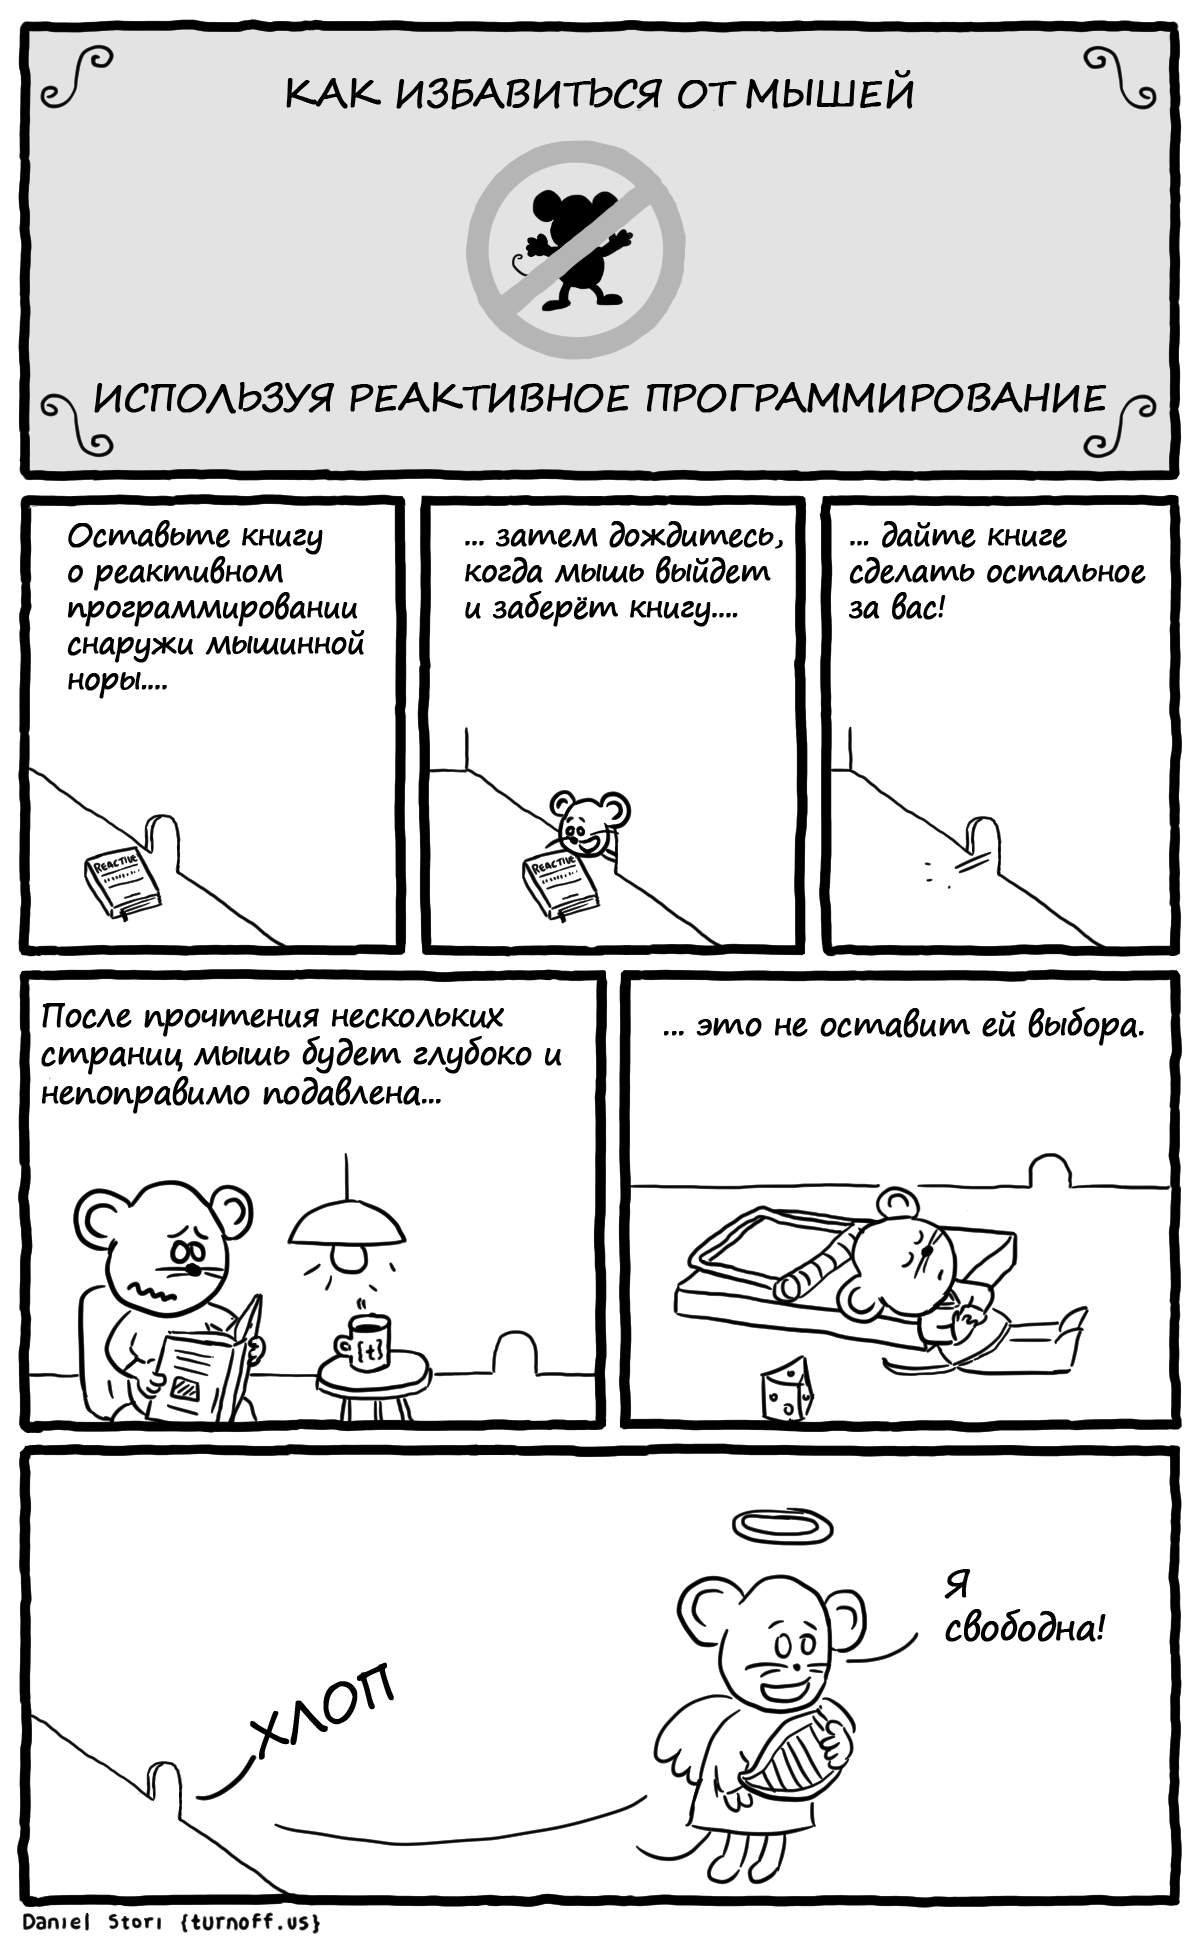 Комиксы Даниэля Стори - 15